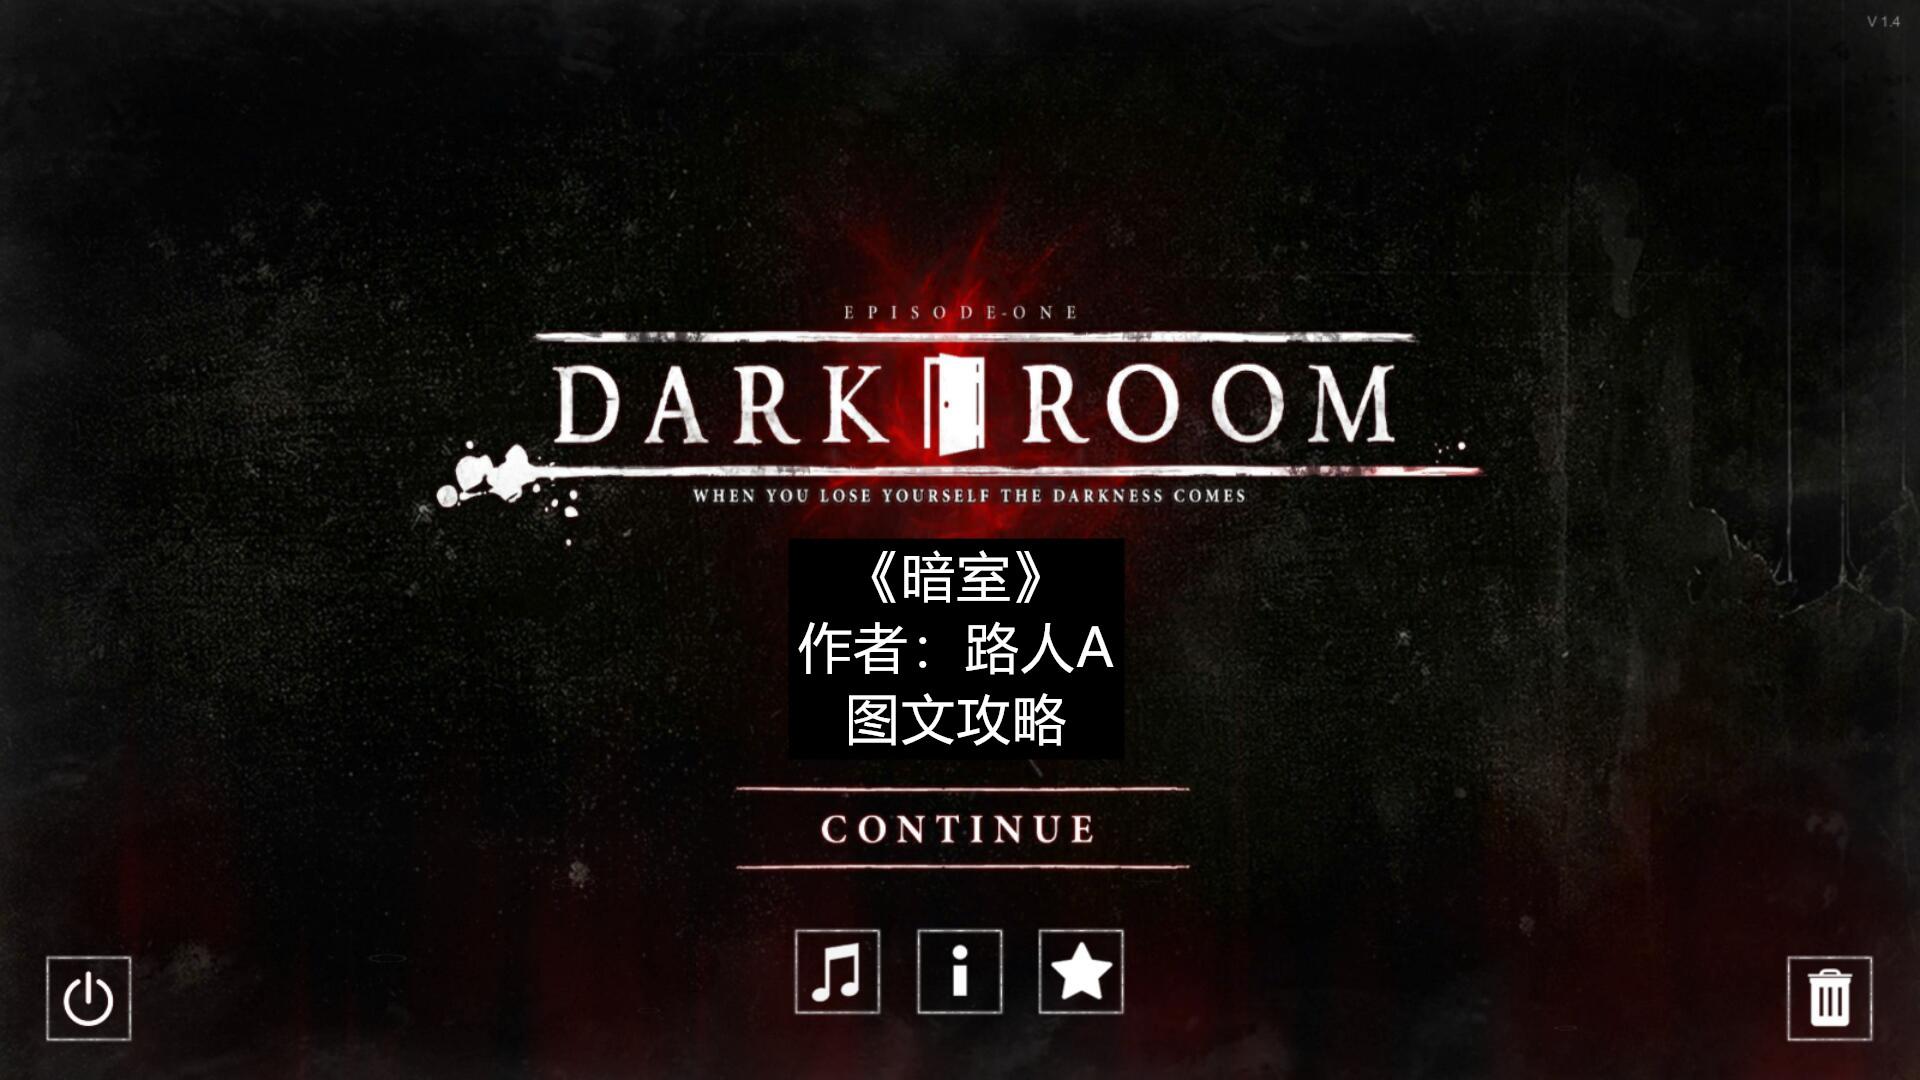 Darkroom游戏攻略合集 暗室全难度攻略